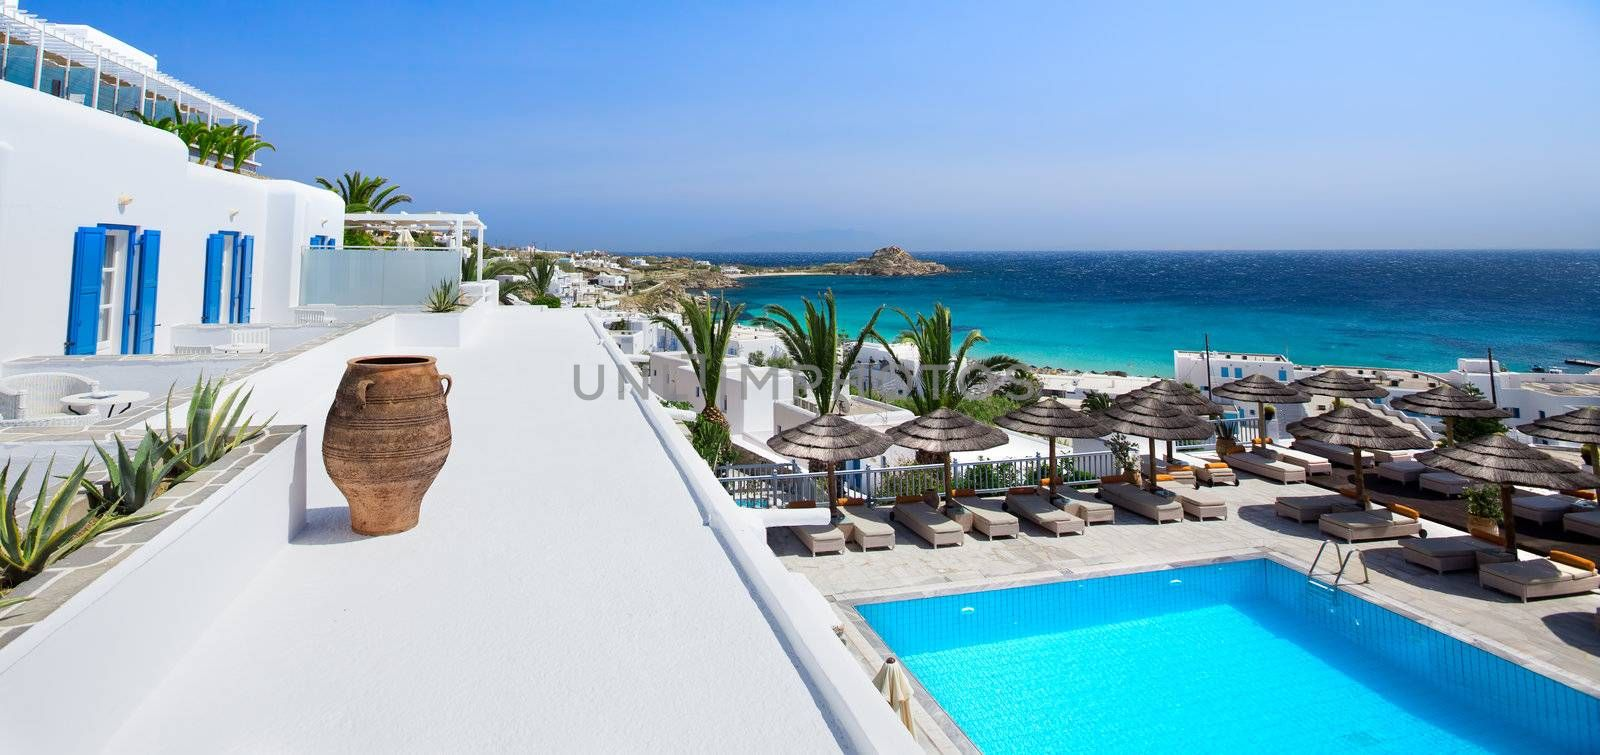 Resort on Mykonos